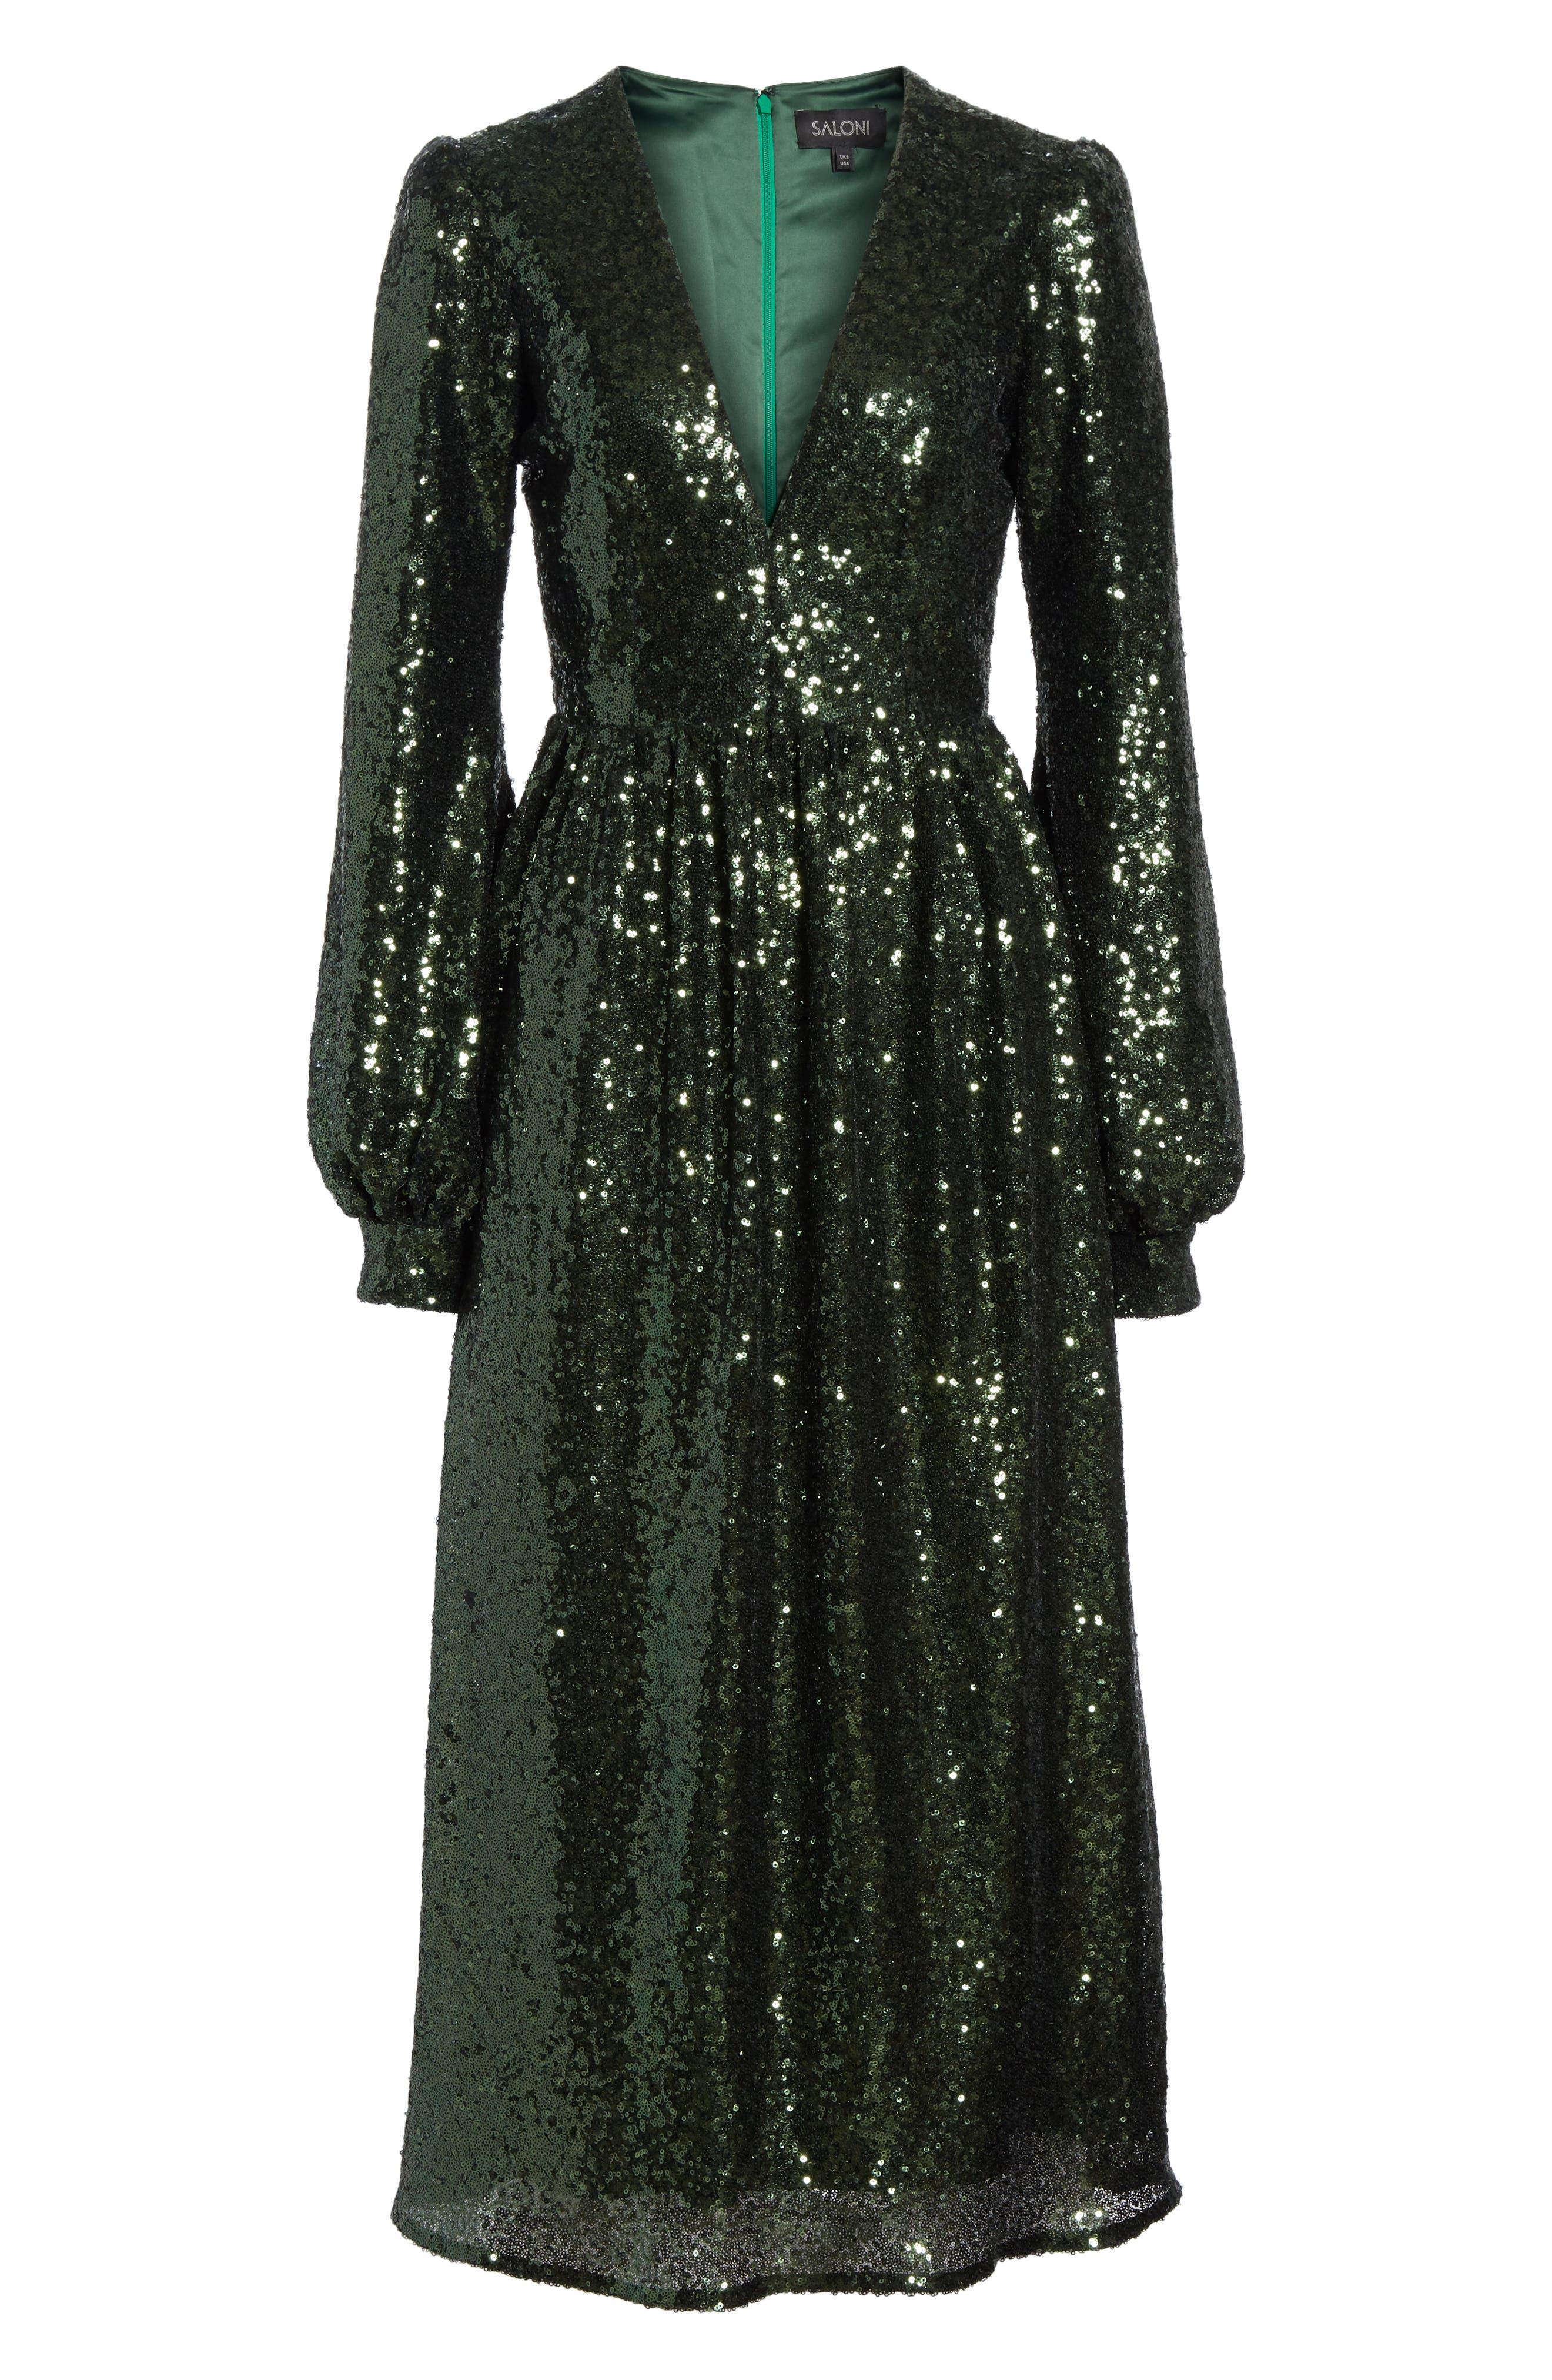 SALONI, Camille Sequin Midi Dress, Alternate thumbnail 7, color, DARK GREEN